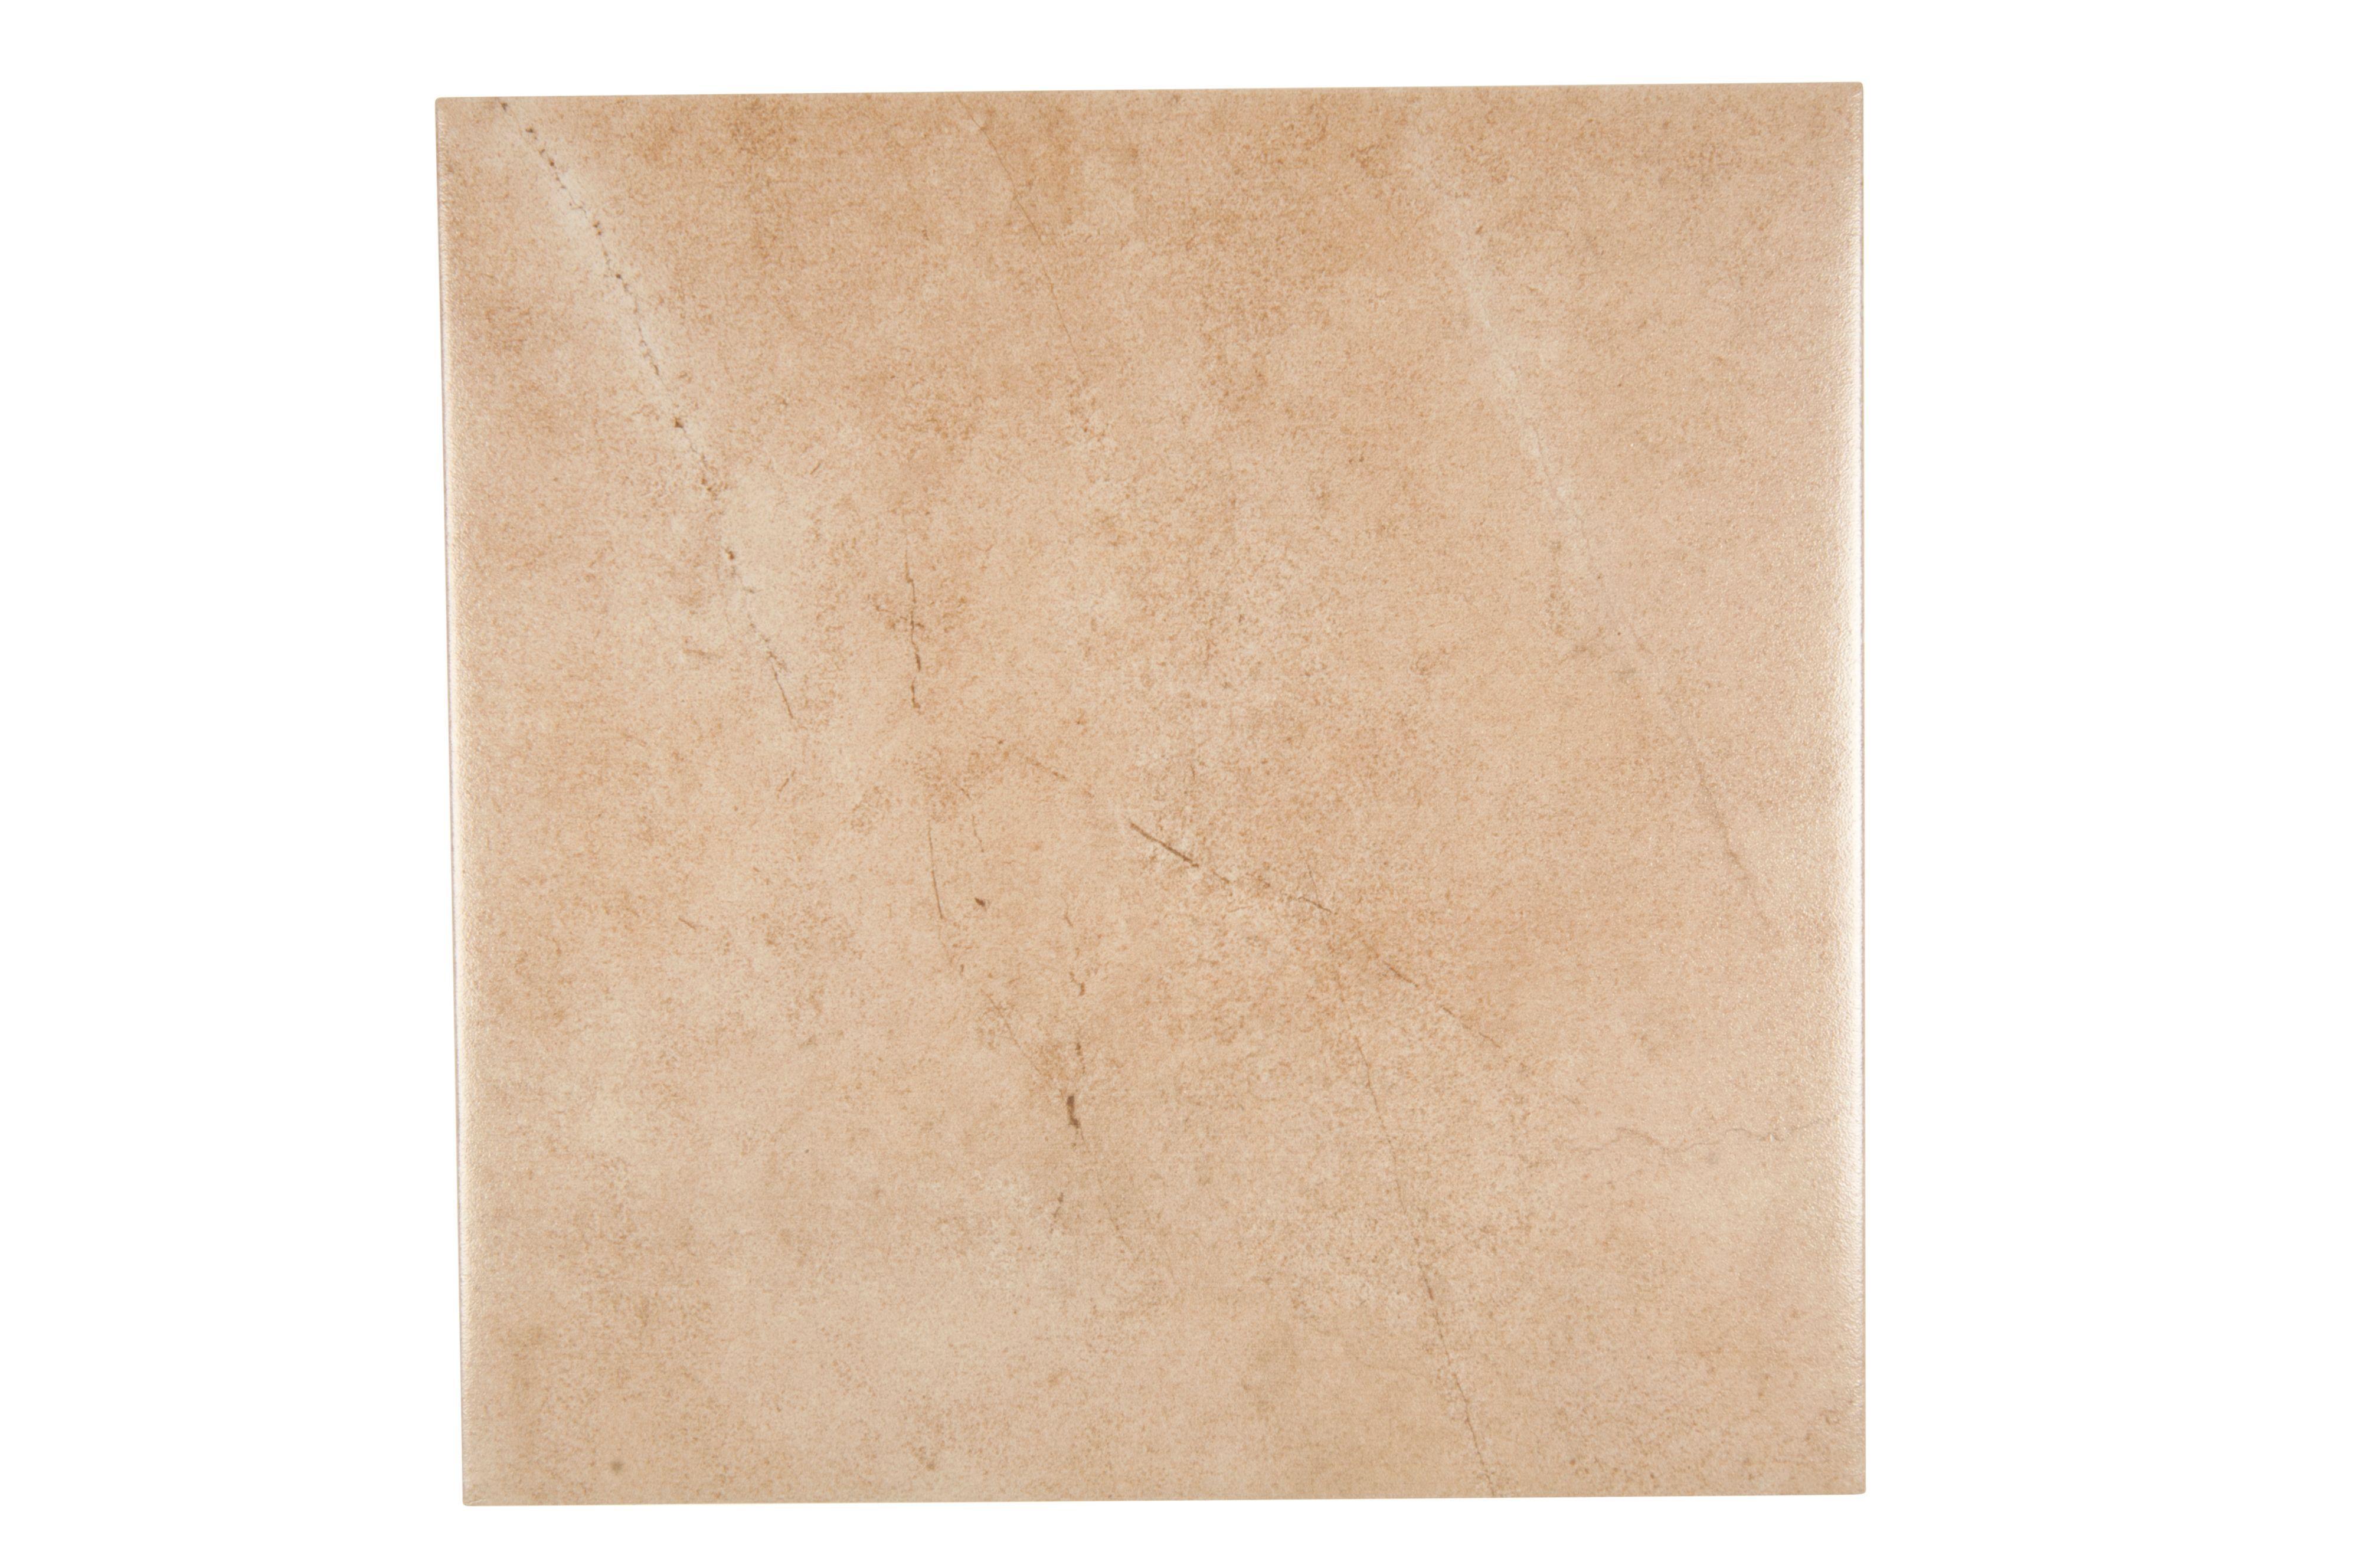 Legend Beige Stone Effect Ceramic Wall Tile, Pack Of 8, (l)500mm (w)250mm